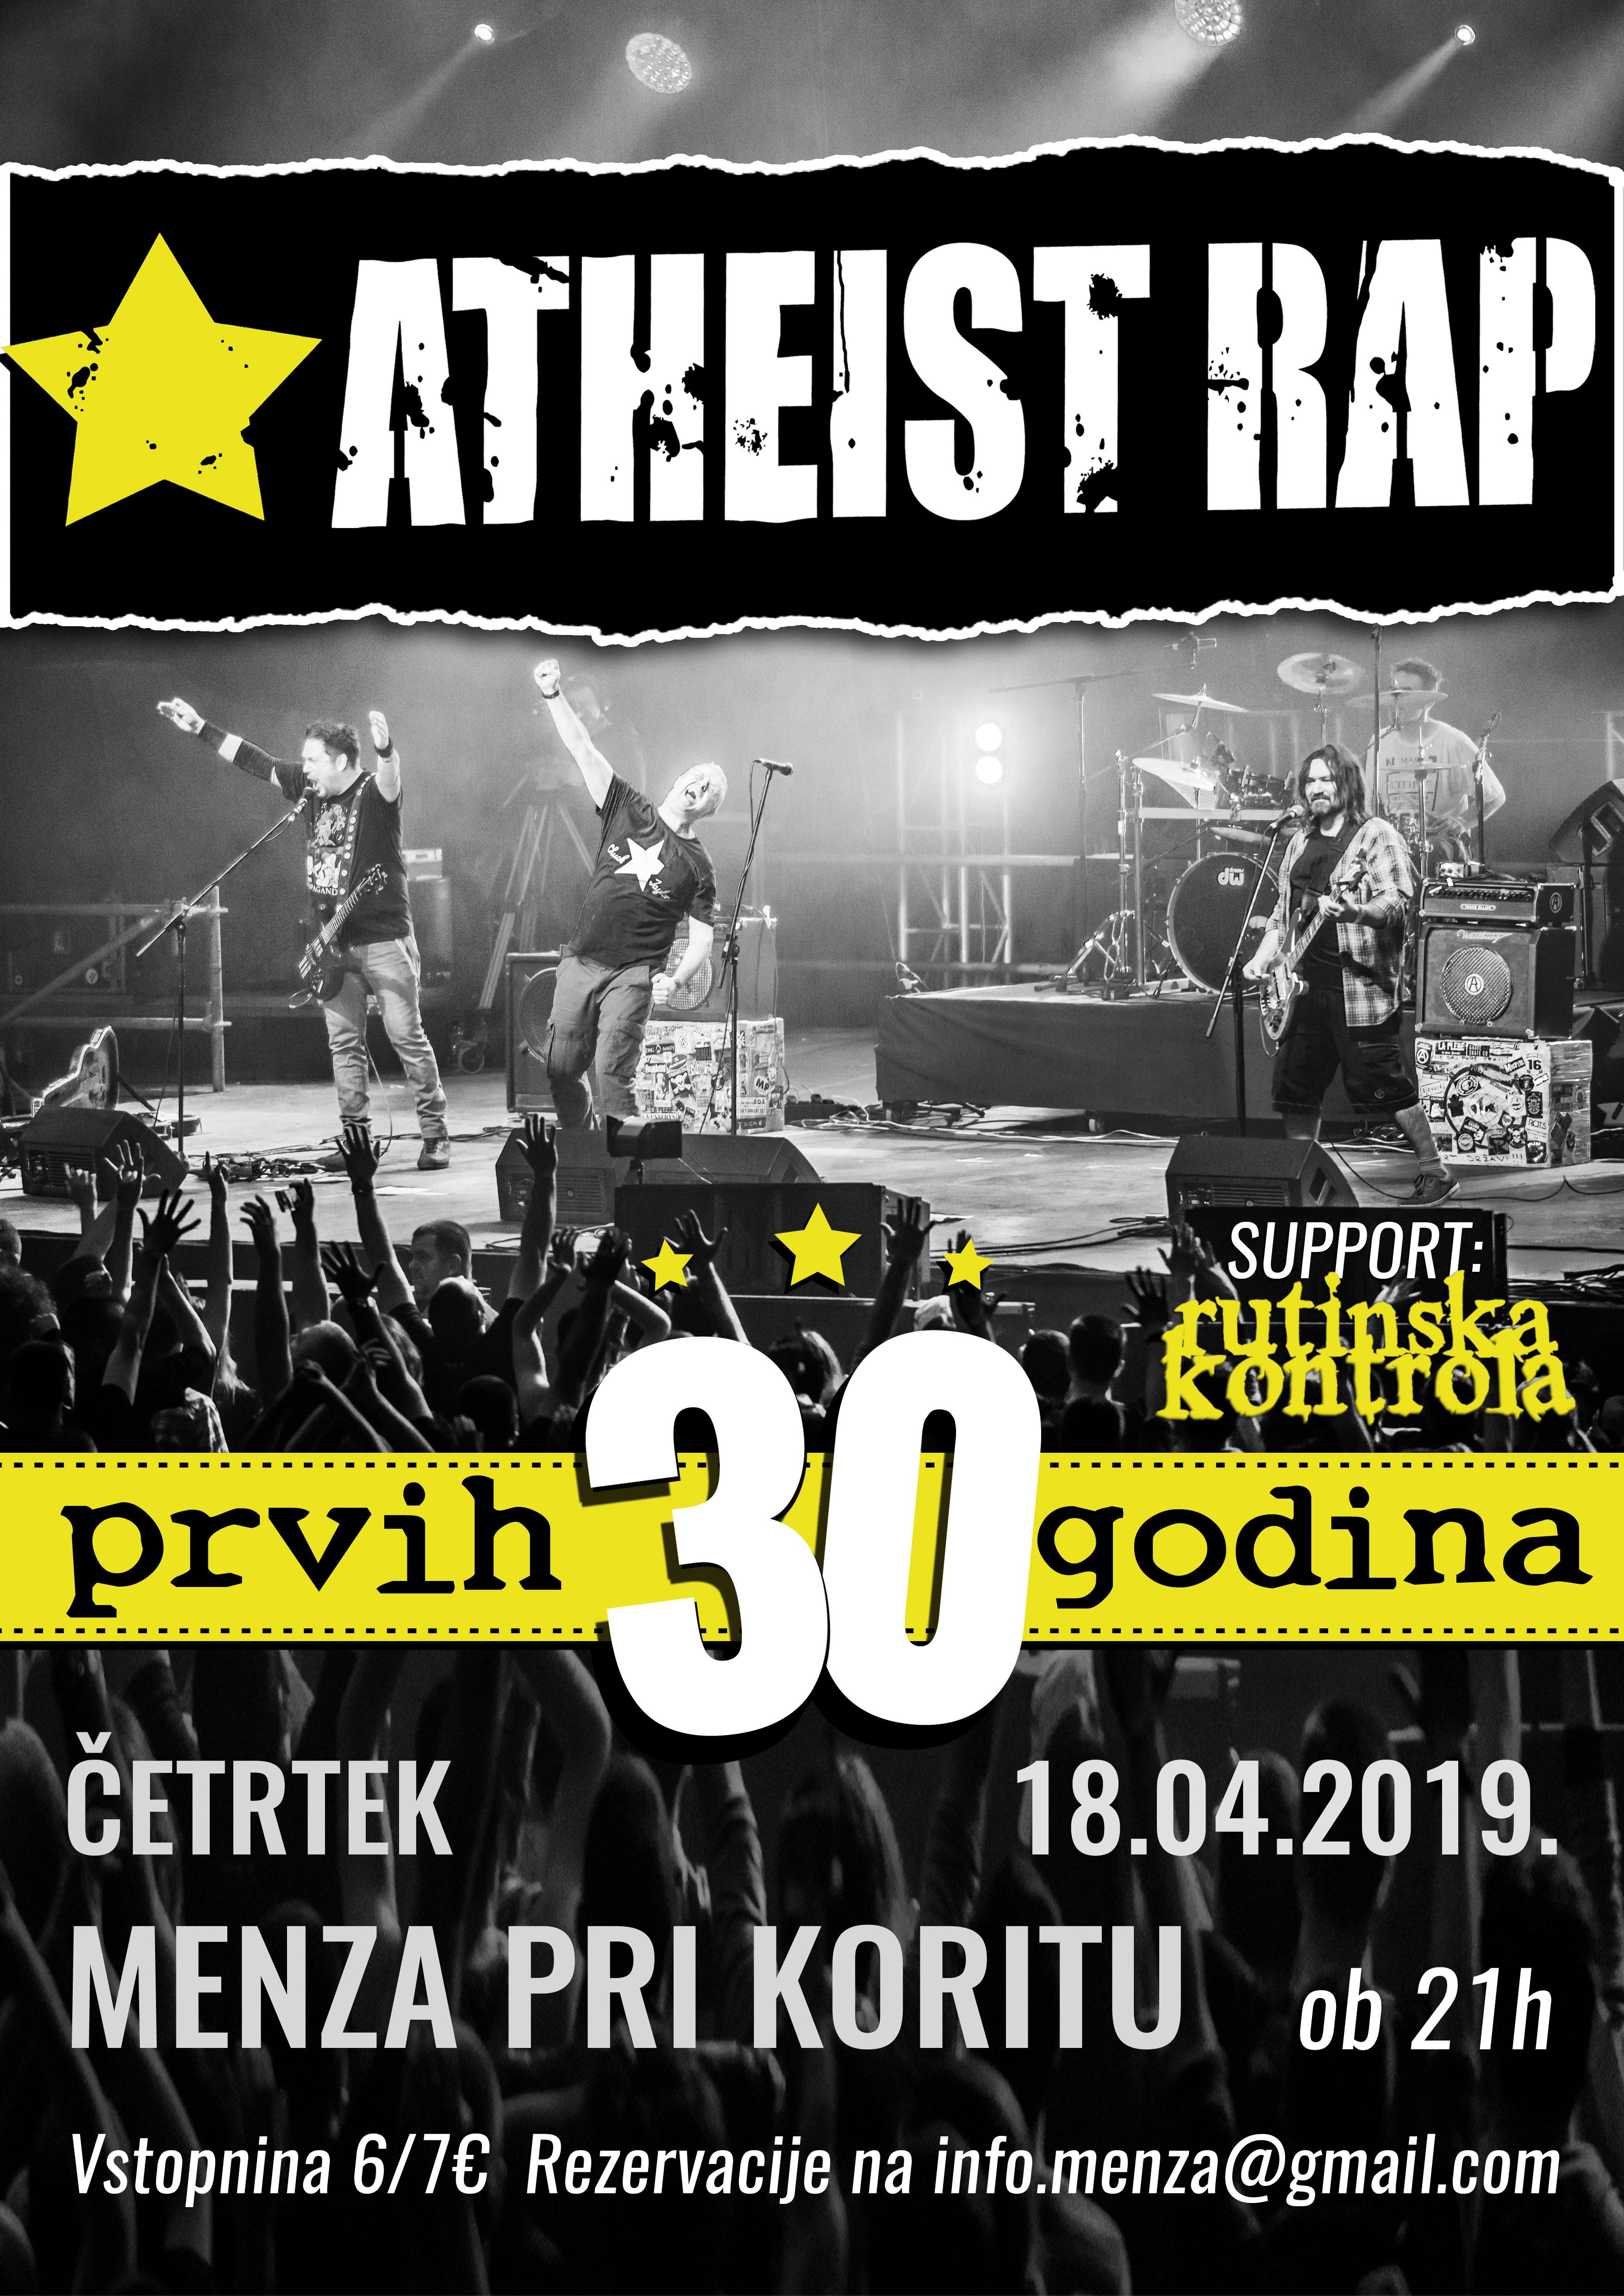 Atheist rap (Srbija) + Rutinska kontrola